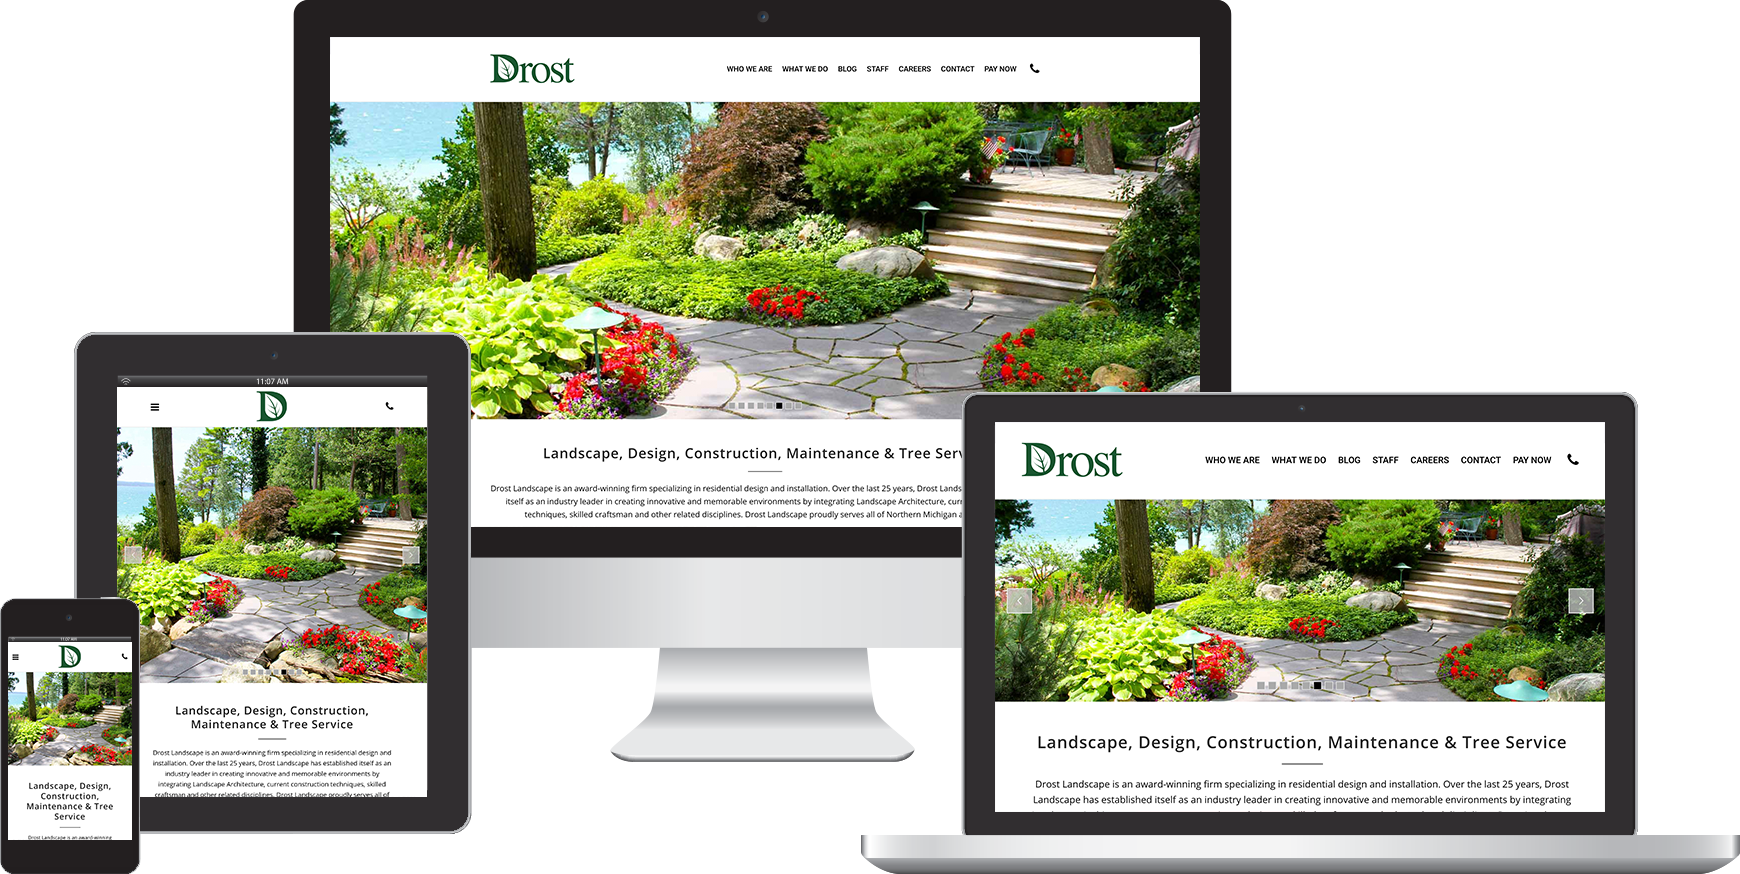 drost landscape website